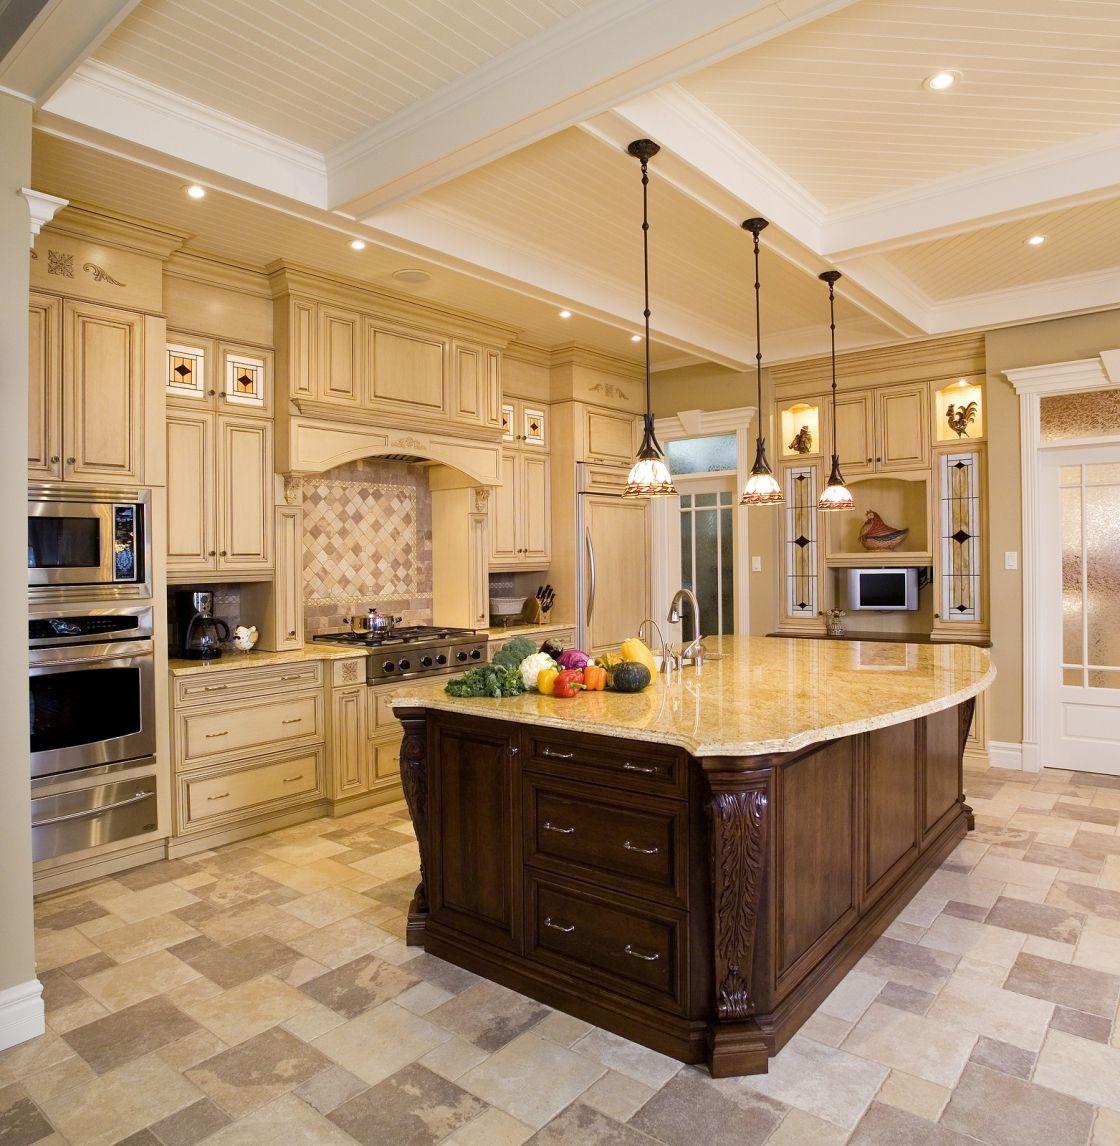 marvellous-kitchen-design-interior-ideas-with-white-beech-staining ...